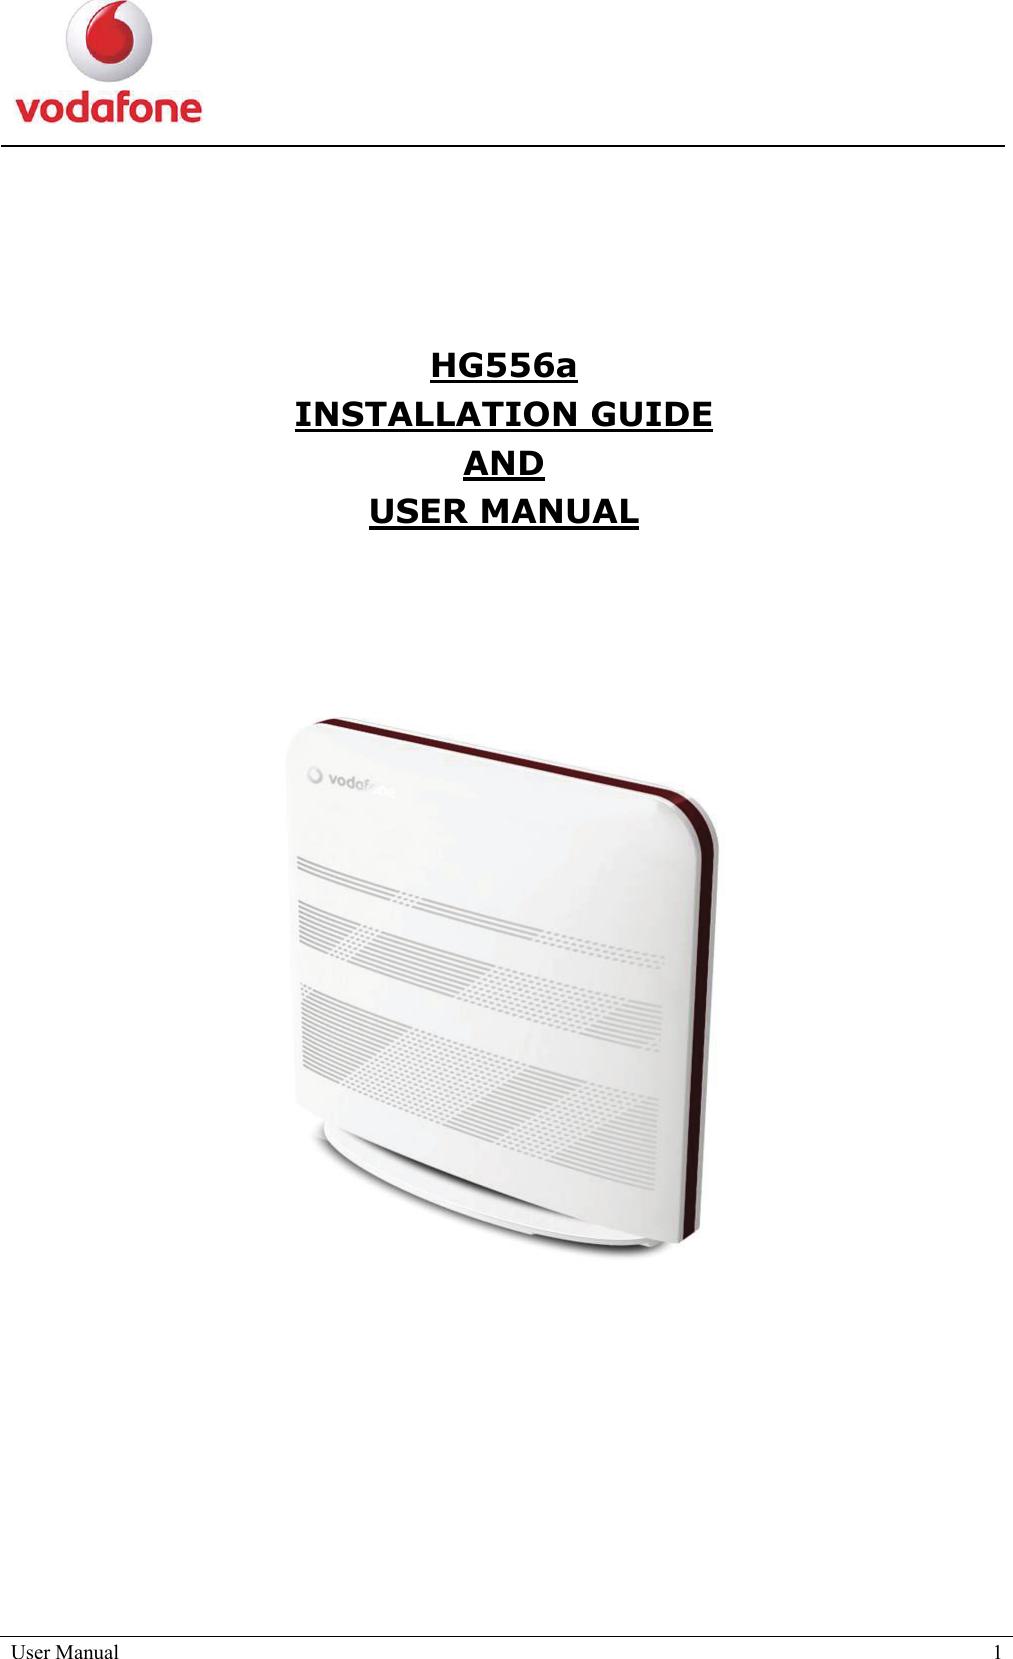 huawei hg556a owner s manual rh usermanual wiki User Manual for Huawei Honor 8 Huawei Instruction Book